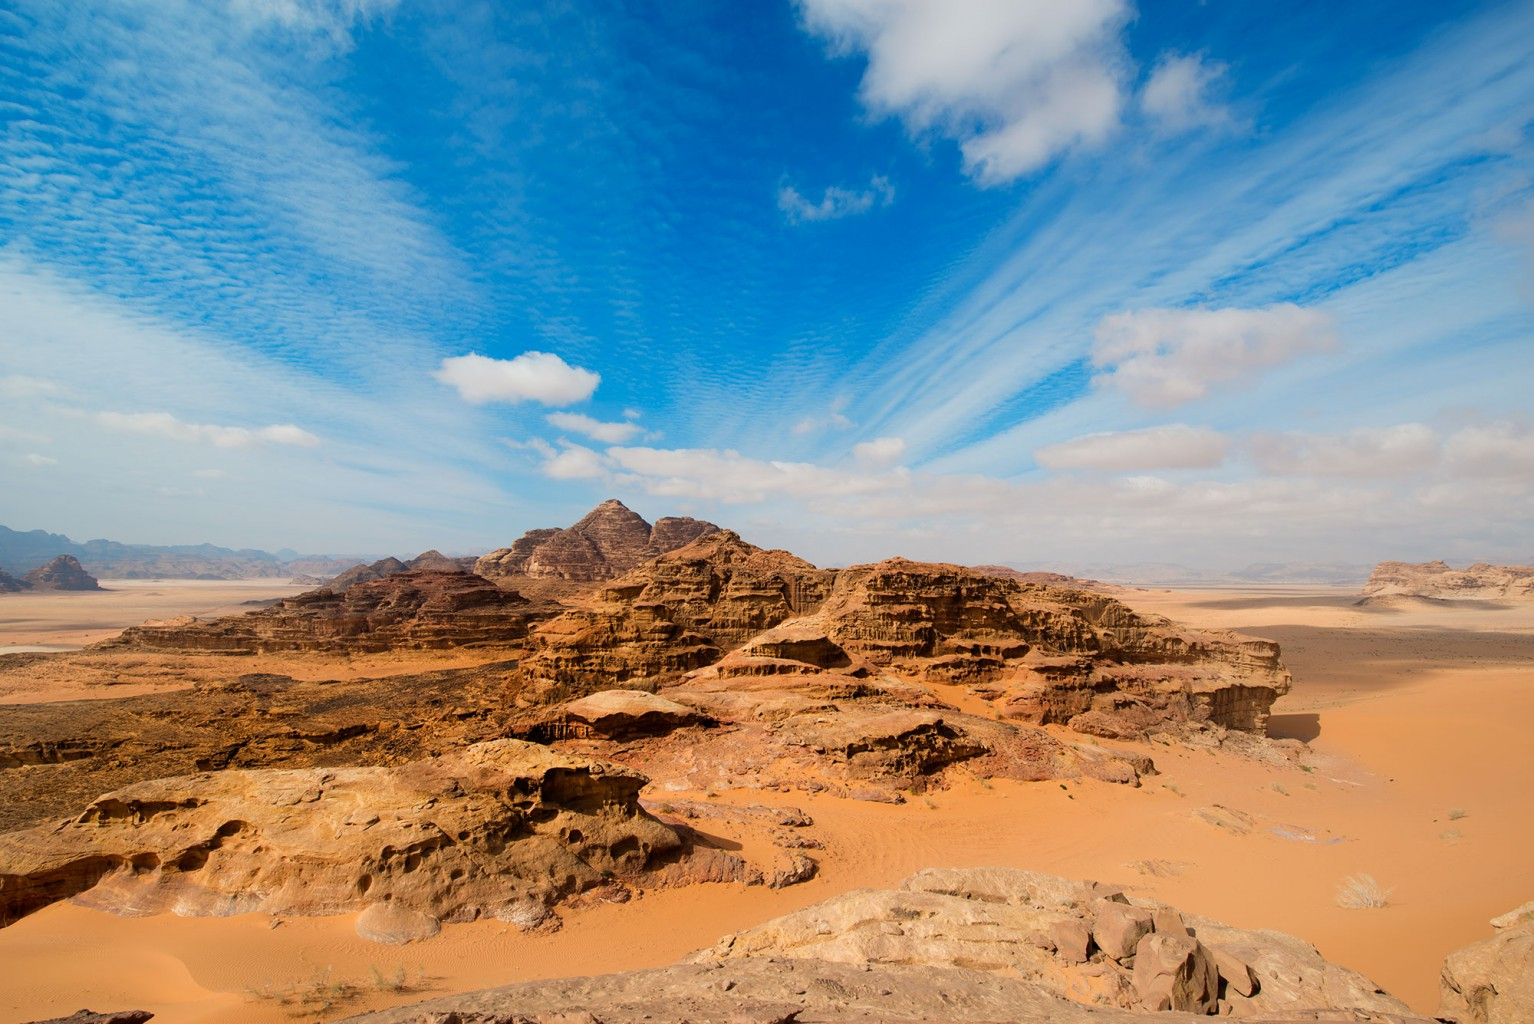 Wadi Rum, breathtaking landscape